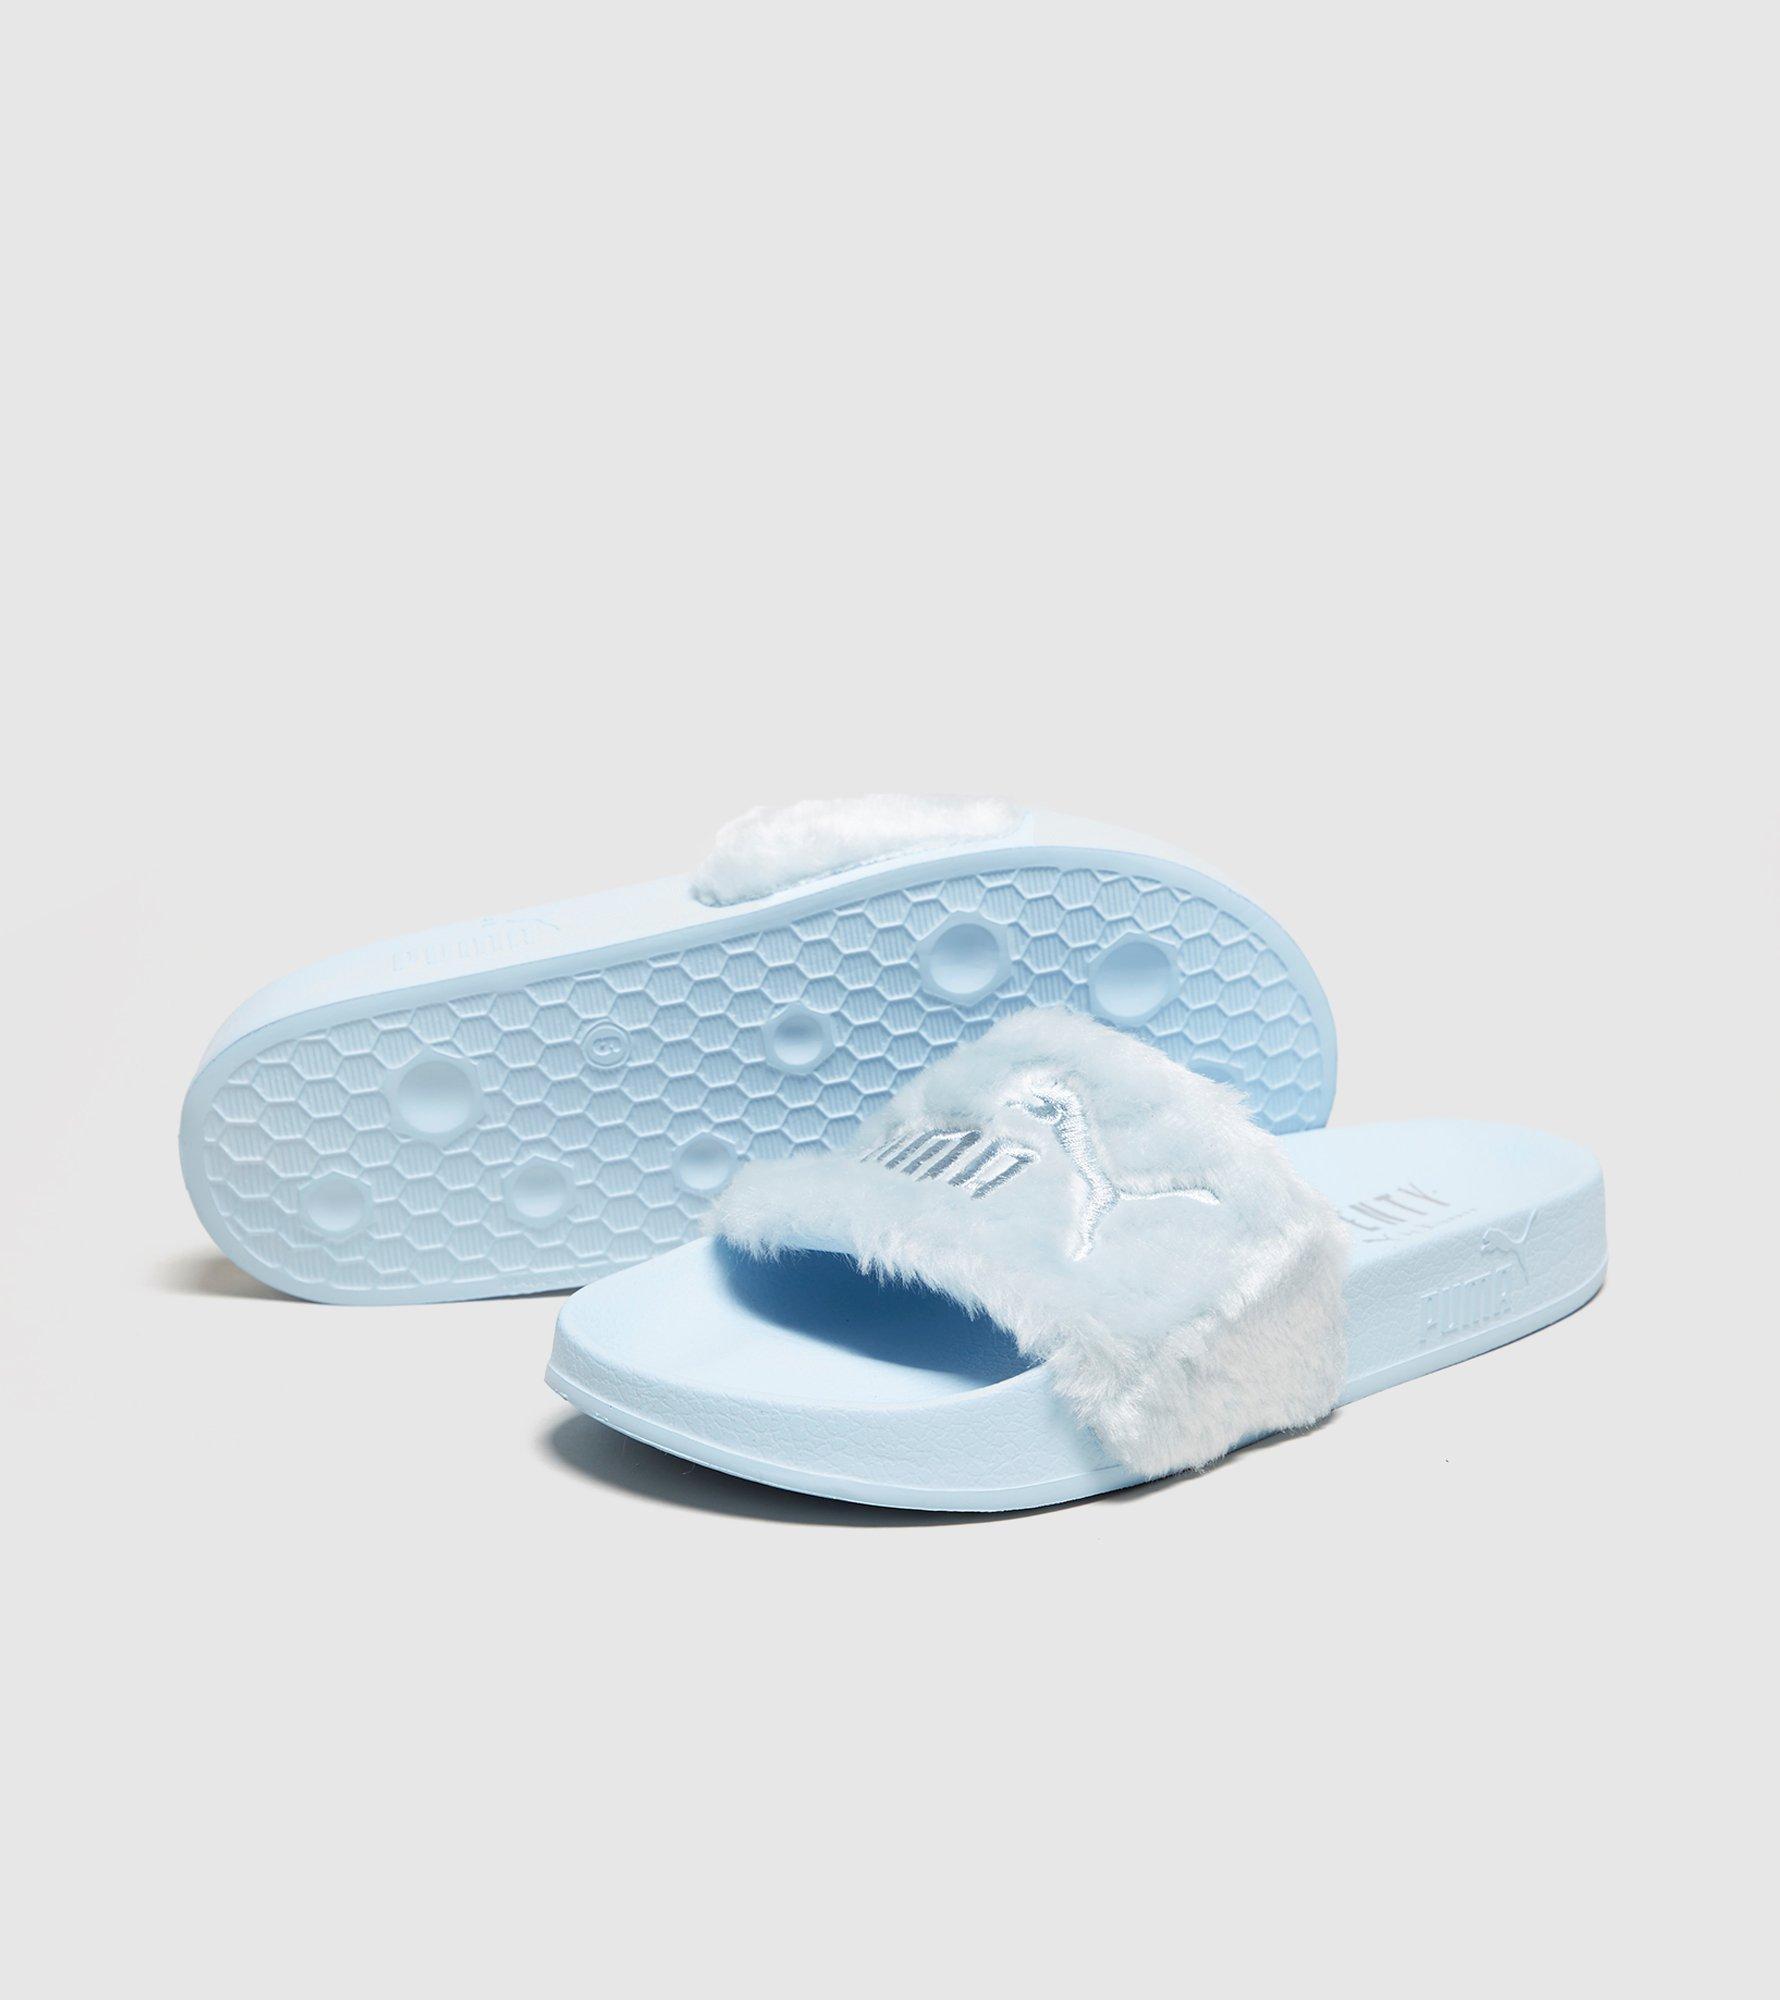 premium selection 6ce8b 73742 PUMA - Blue Fenty Fur Slides Women's - Lyst